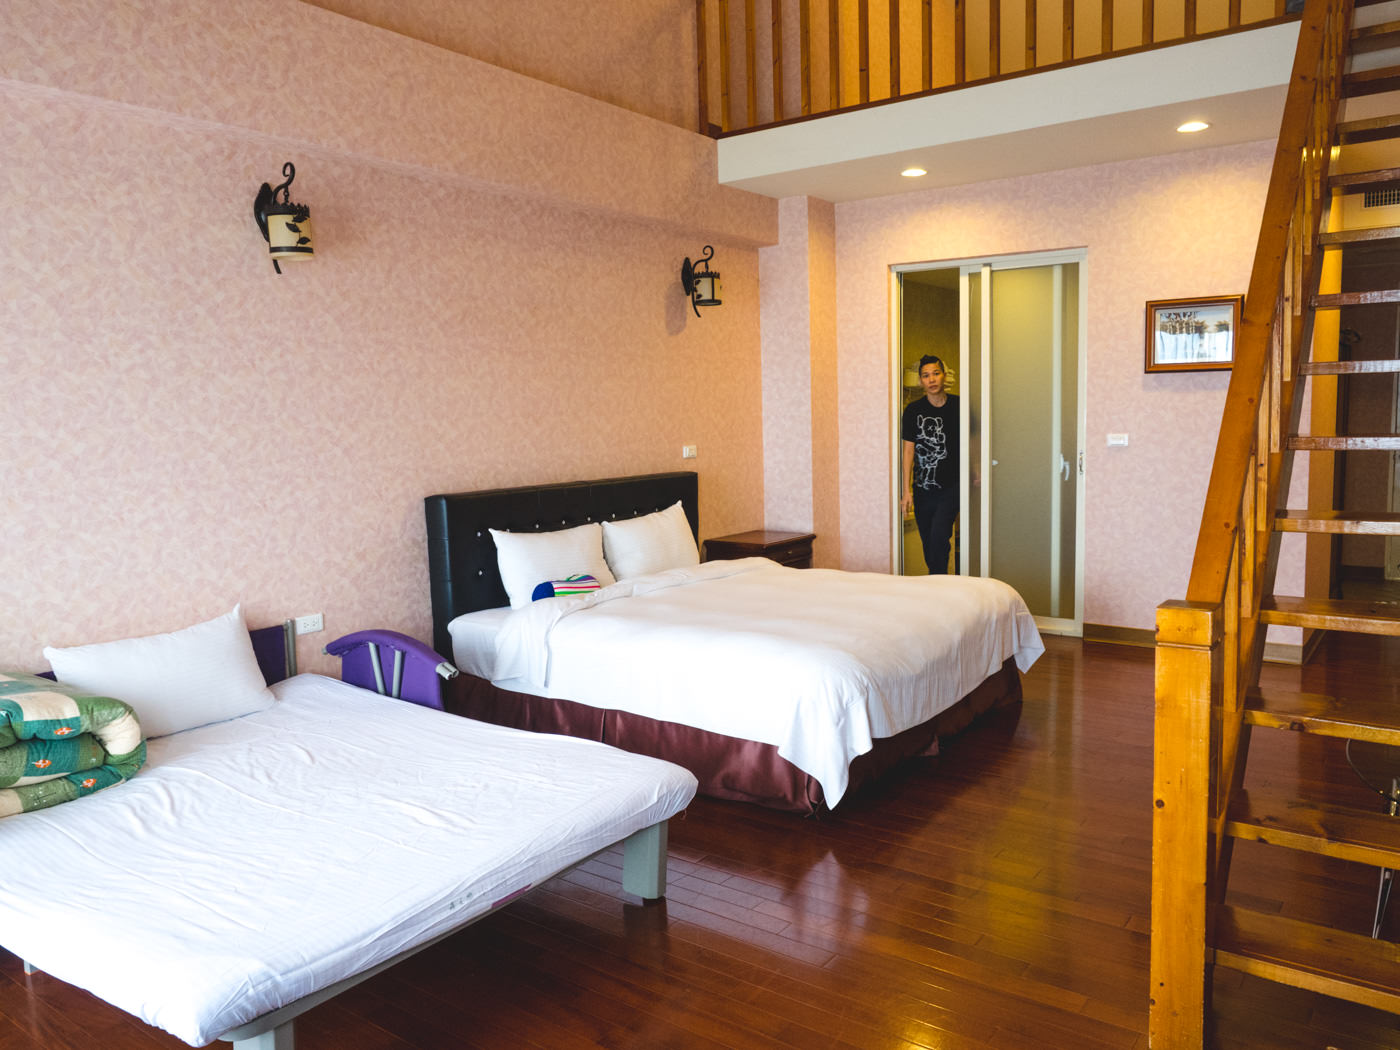 Taiwan - Qingjing - Spacious room